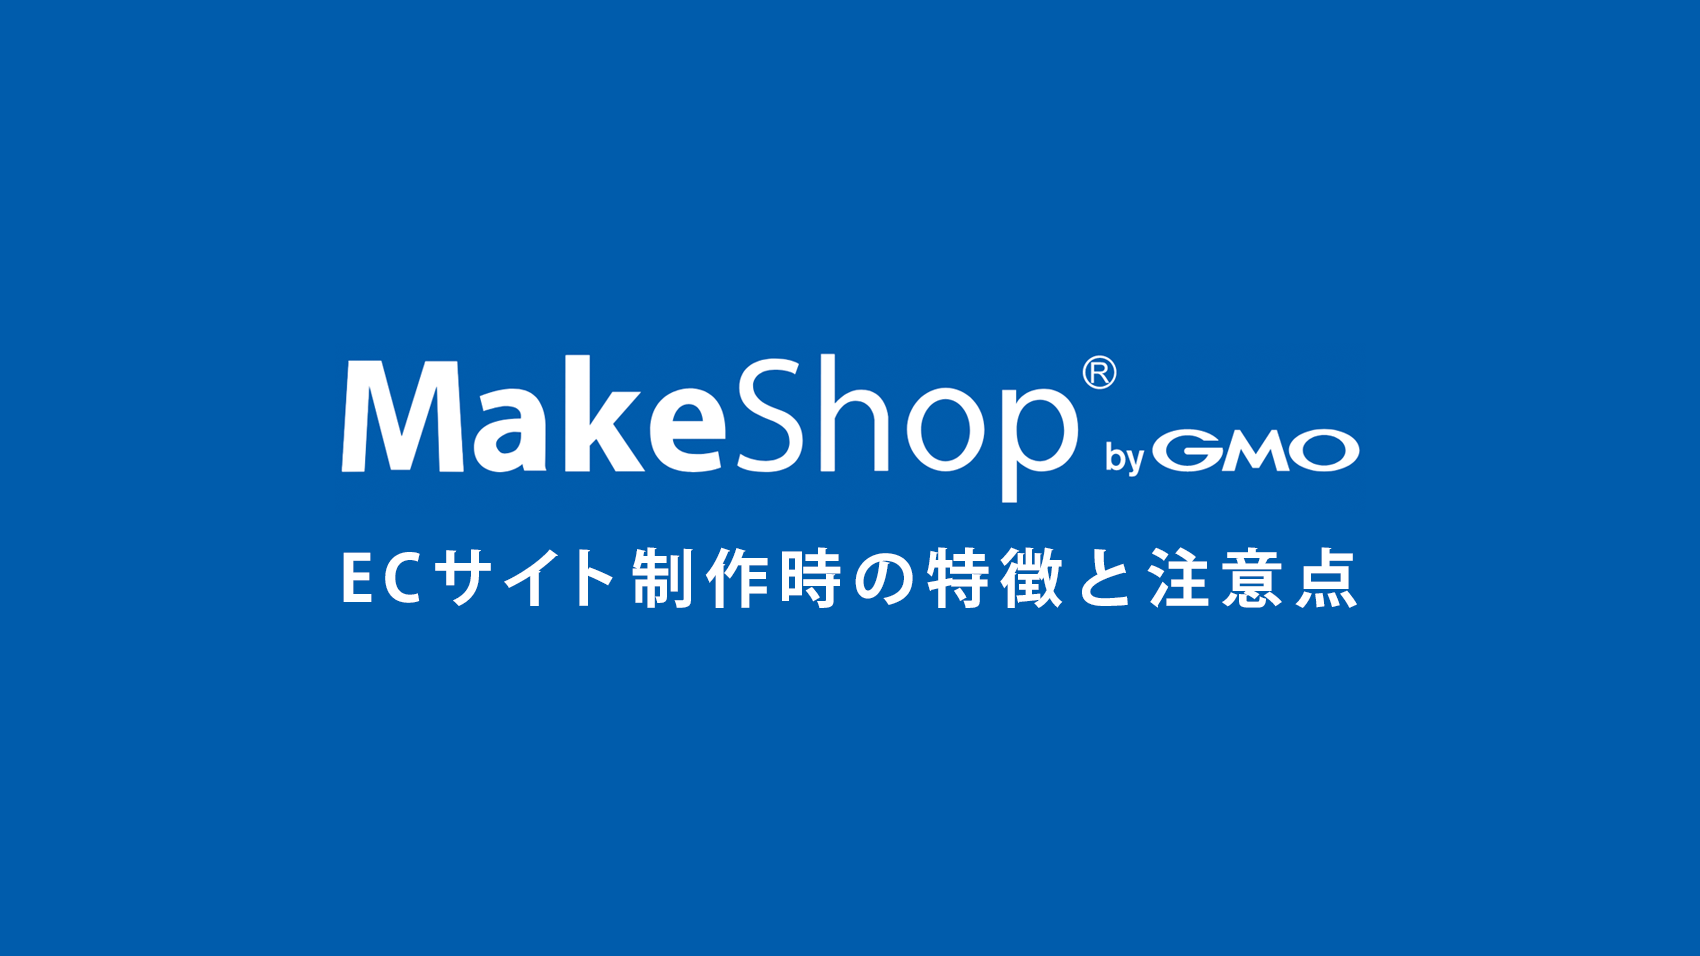 MakeShopでECサイトを制作するときの特徴と注意点をまとめてみた